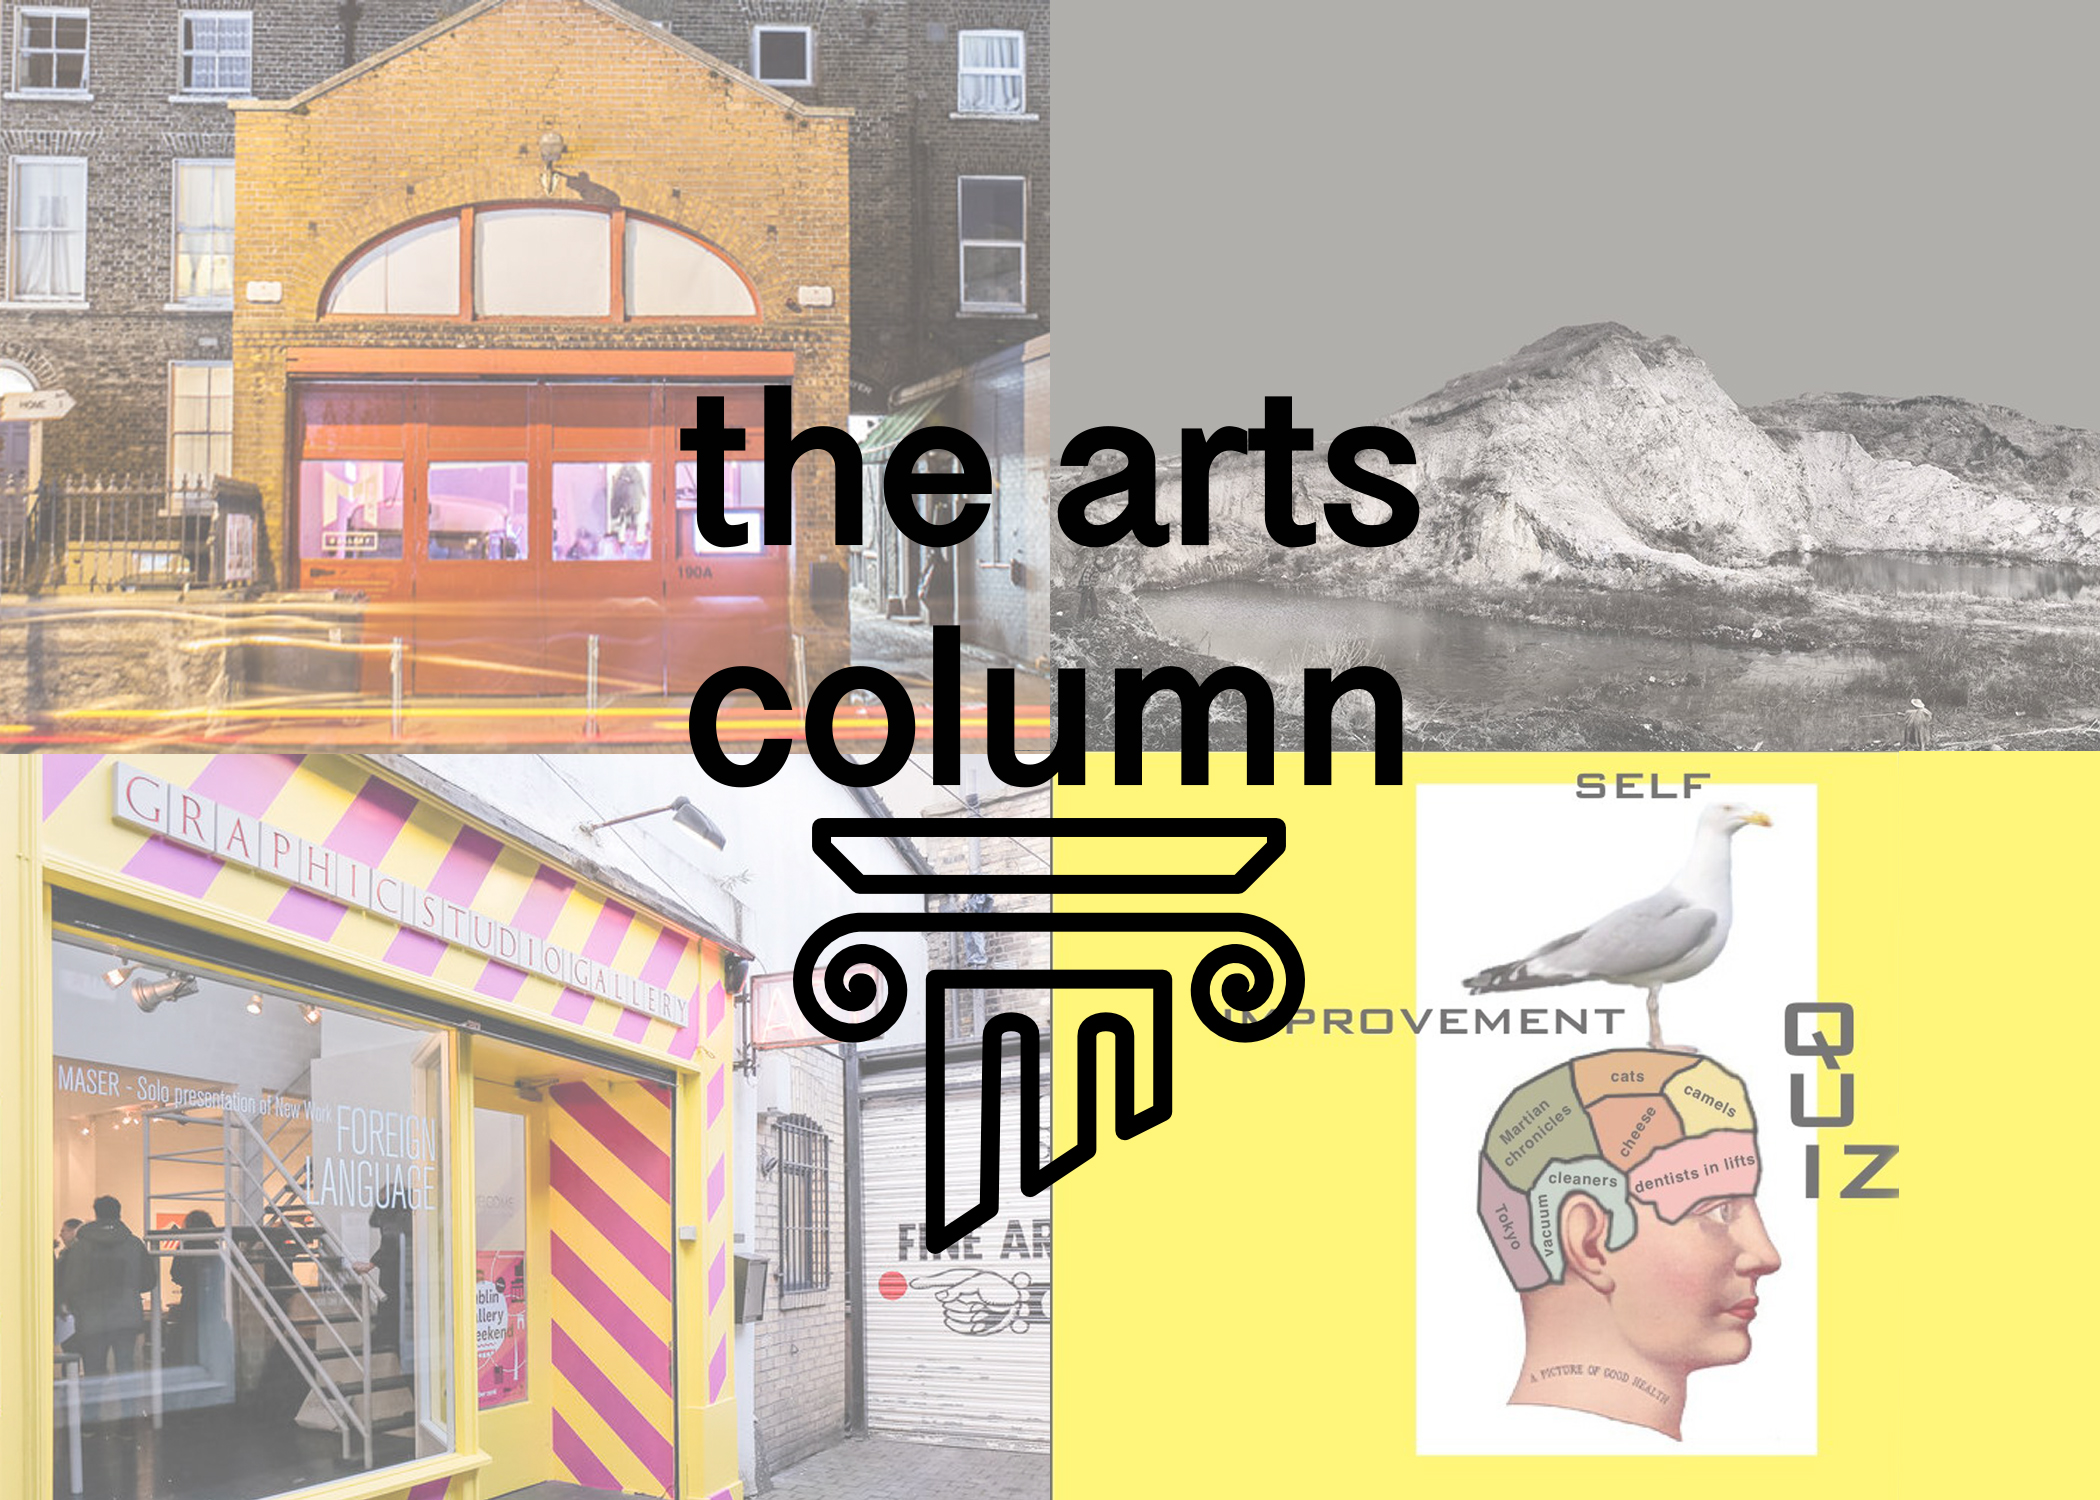 the_arts_column_33